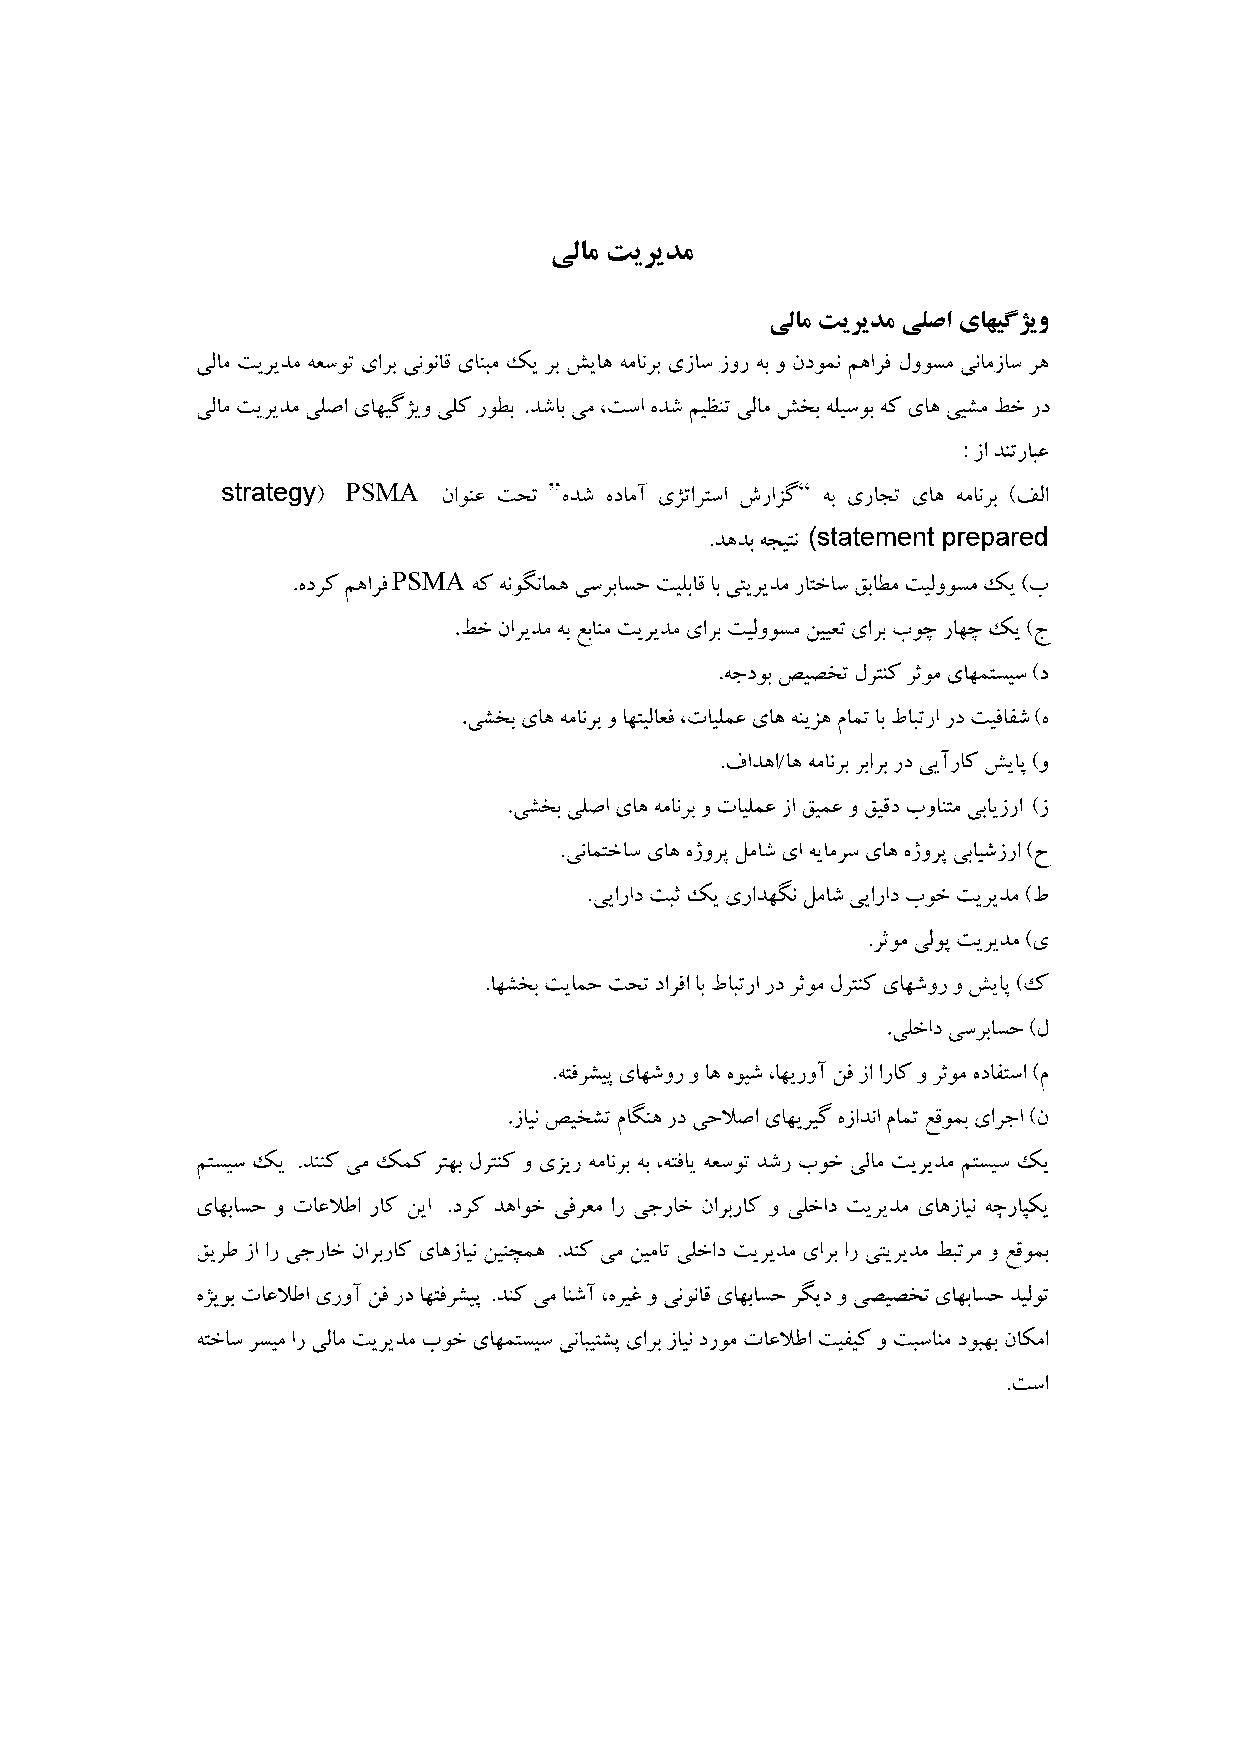 ترجمه مقاله و تحقیق - مدیریت مالی financial managment